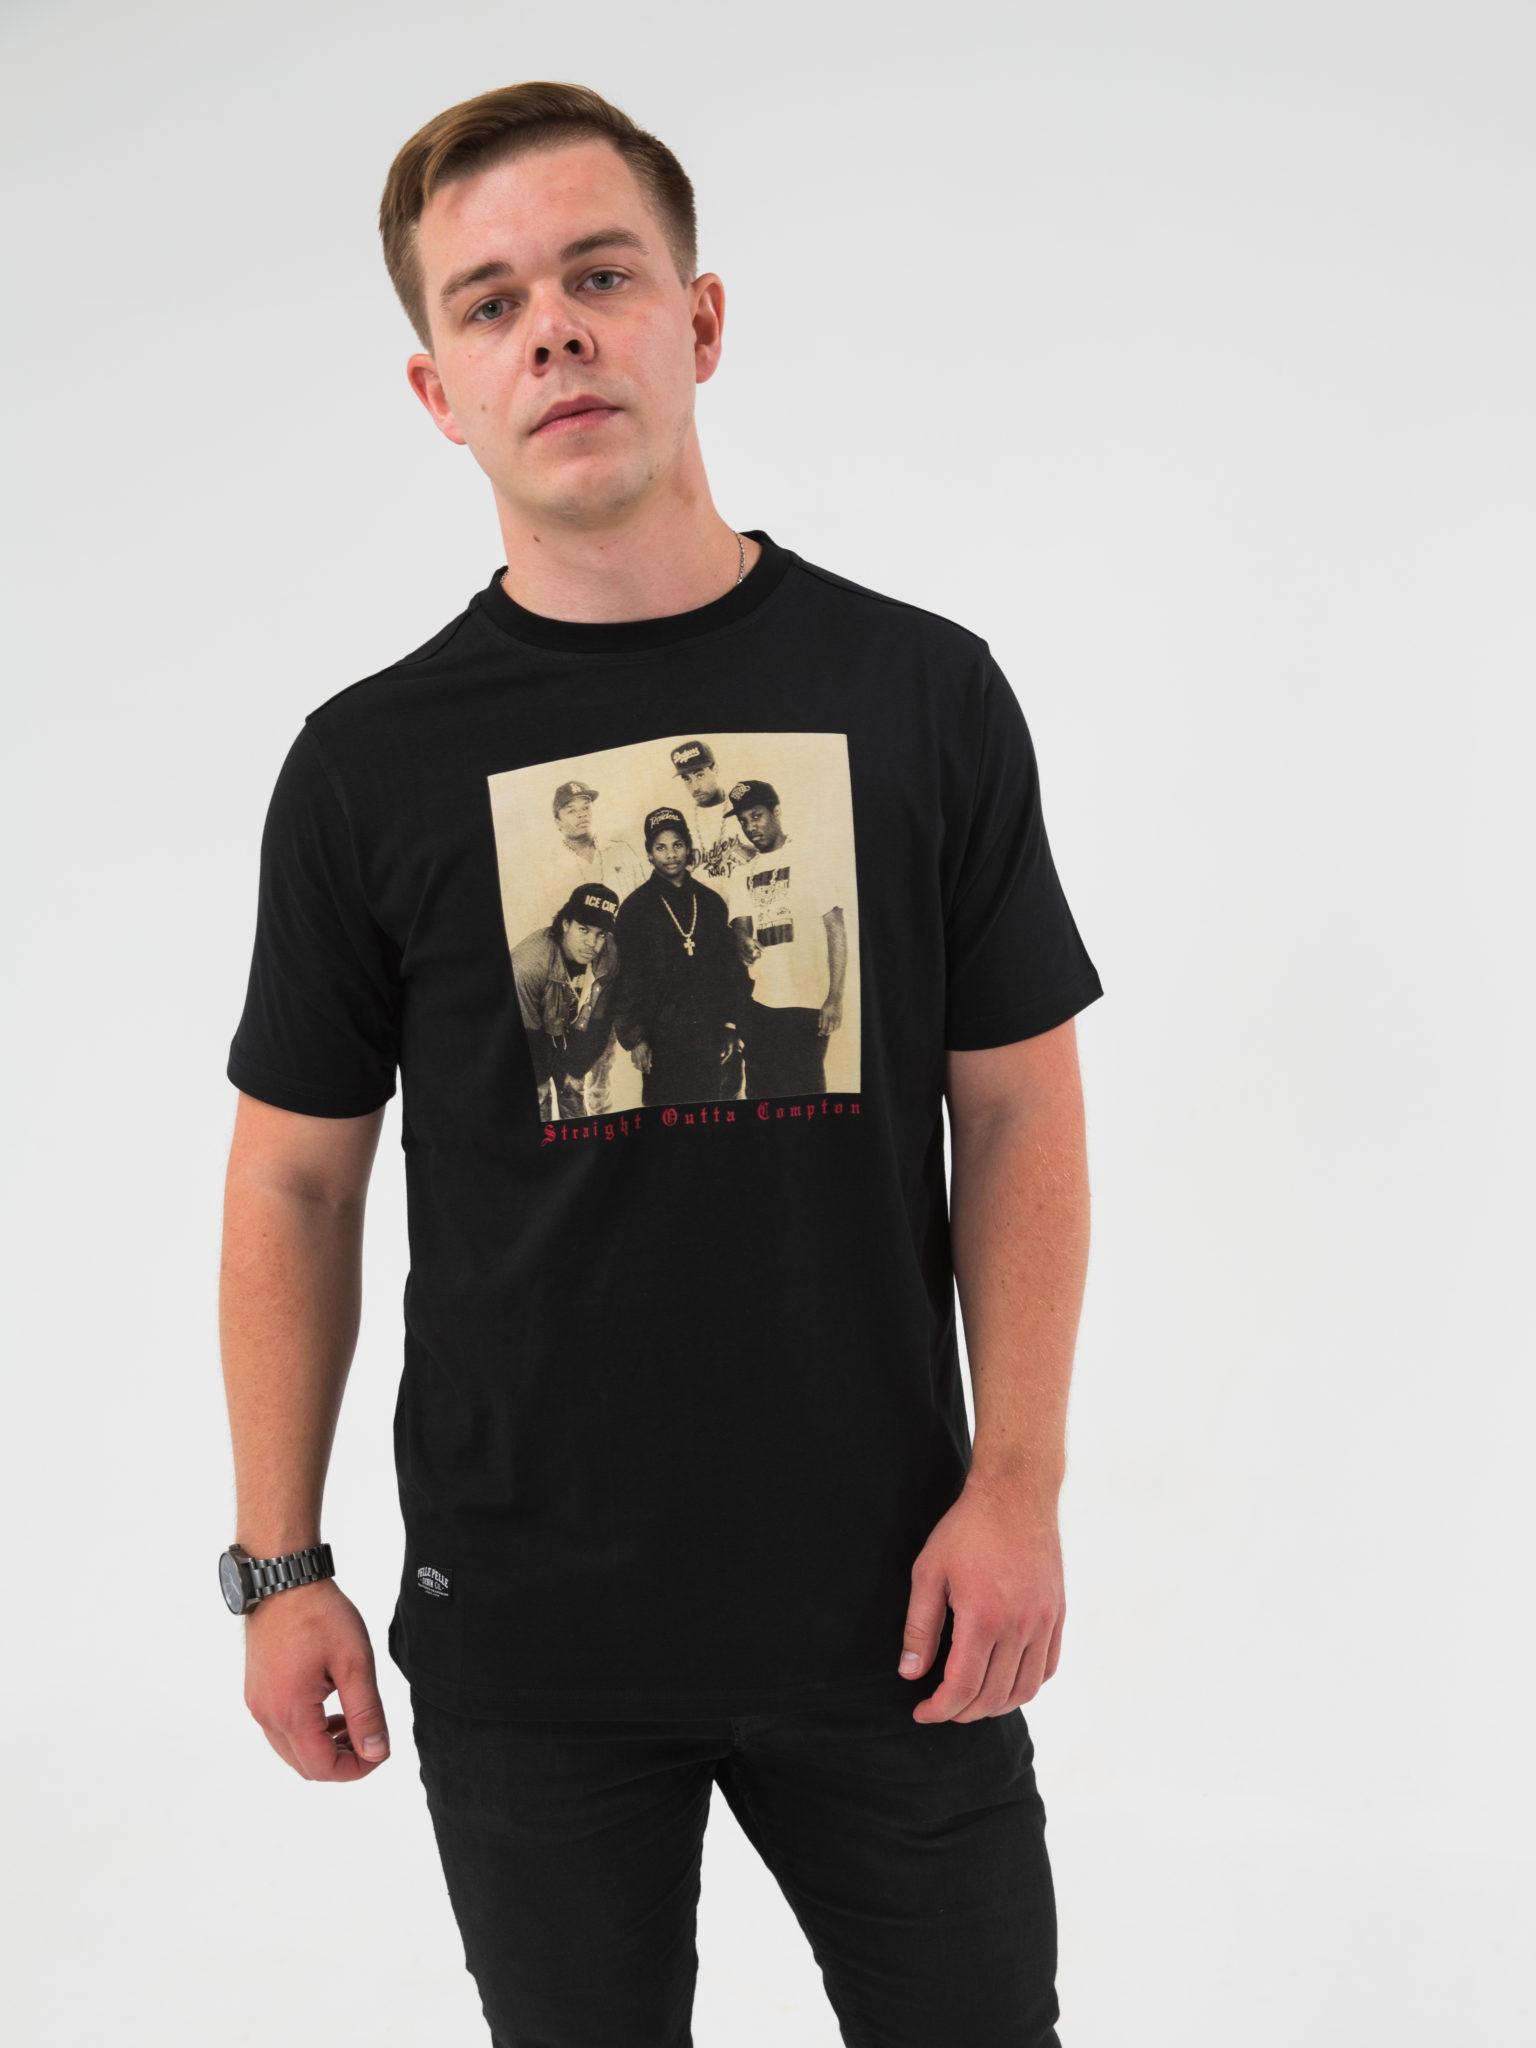 Мужская футболка PELLE PELLE NWA STRAIGHT OUTTA COMPTON